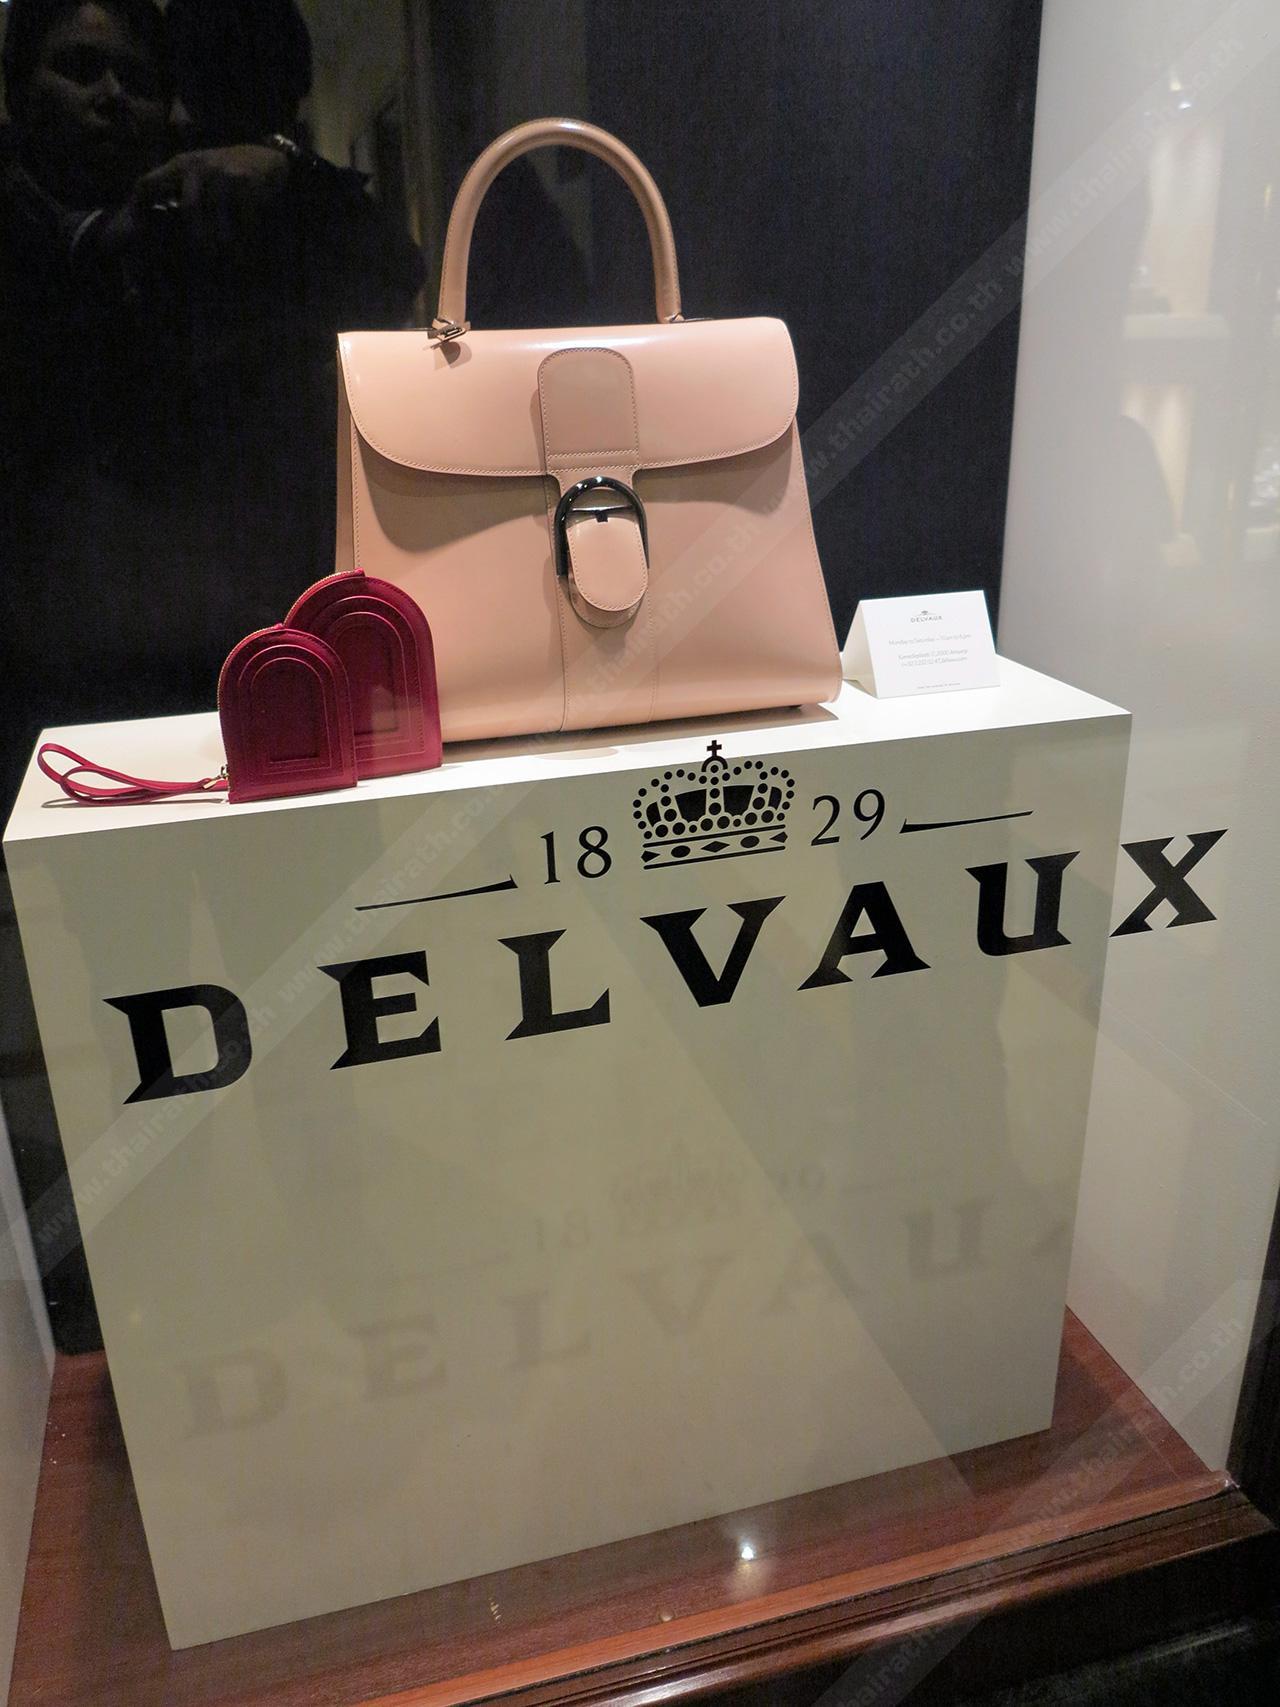 DELVAUX กระเป๋าแบรนด์ เบลเยียมราคาแพงเทียบชั้นหลุยส์ วิตตอง.